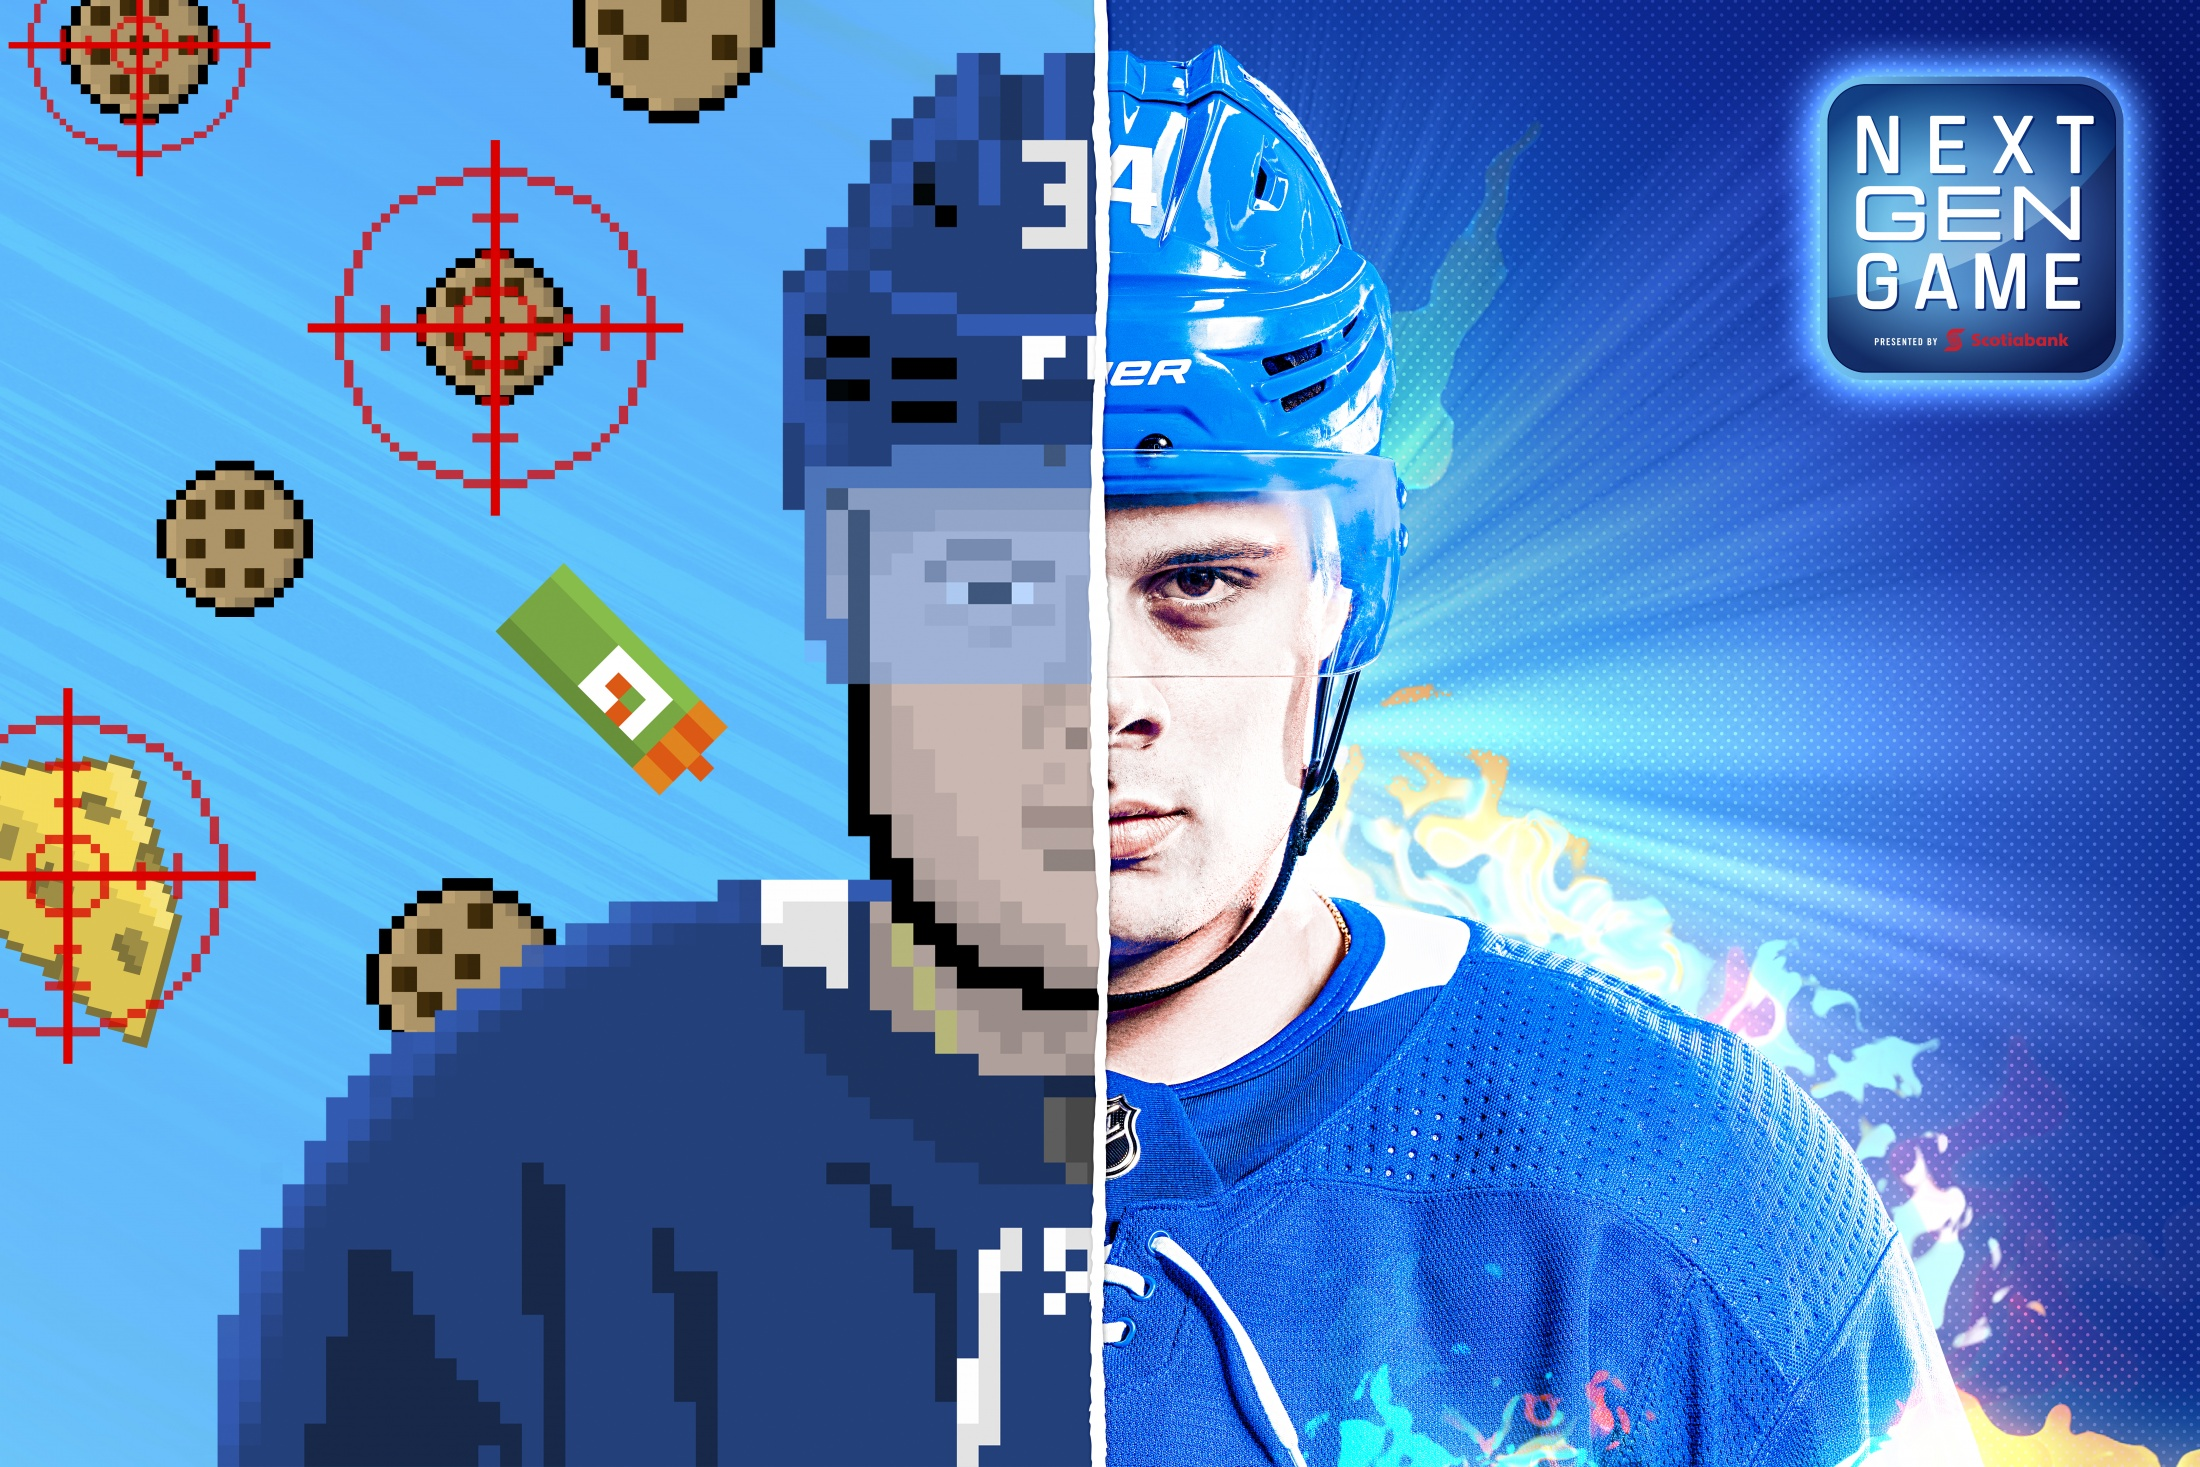 Thumbnail for Toronto Maple Leafs - Next Gen Game